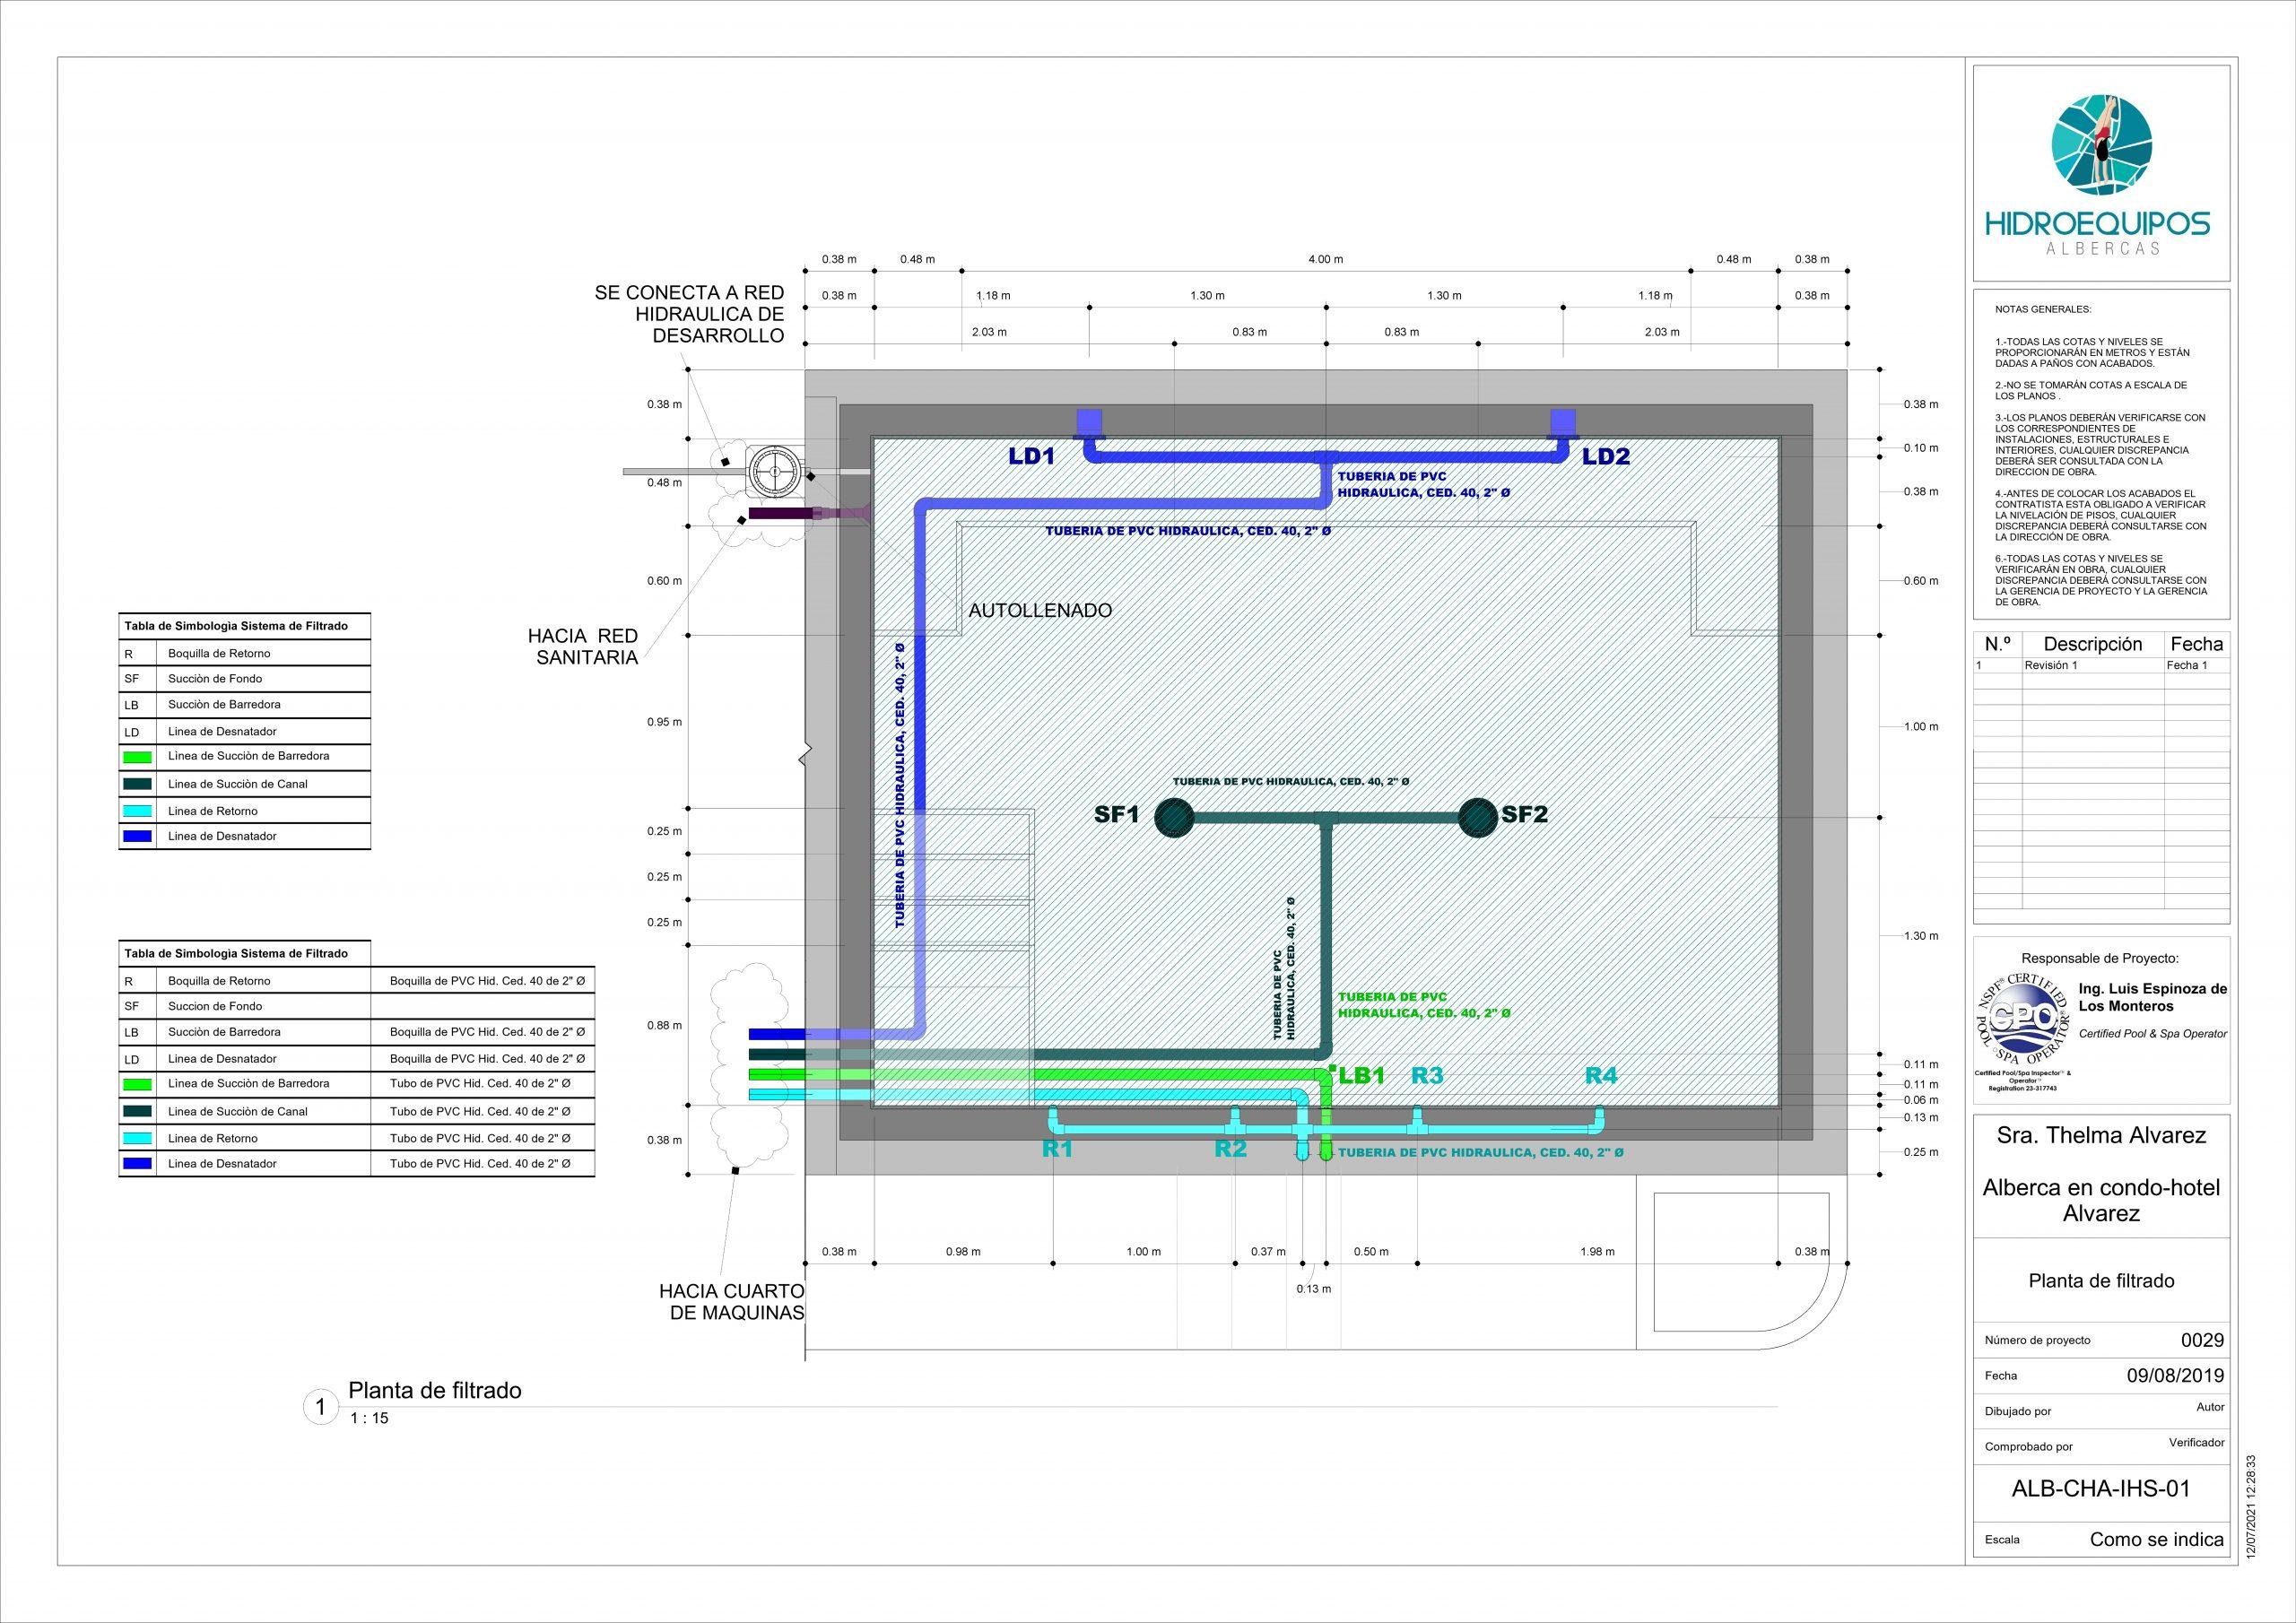 29 – Plano – ALB-CHA-IHS-01 – Planta de filtrado